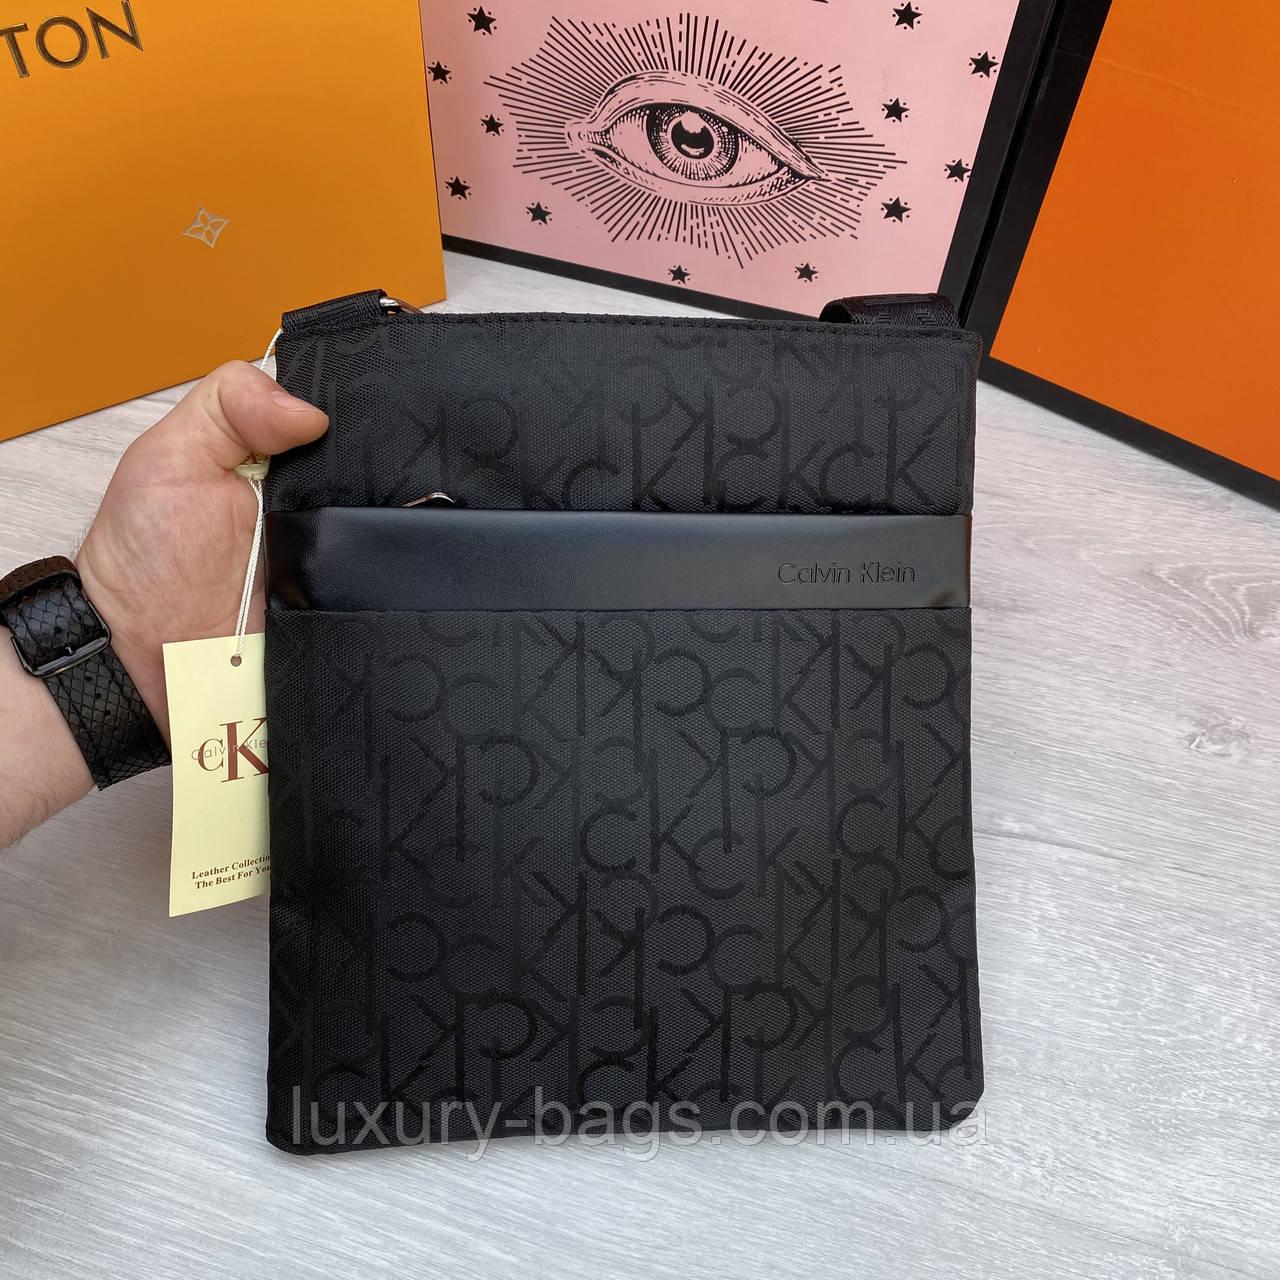 Стильна чоловіча сумка Calvin Klein